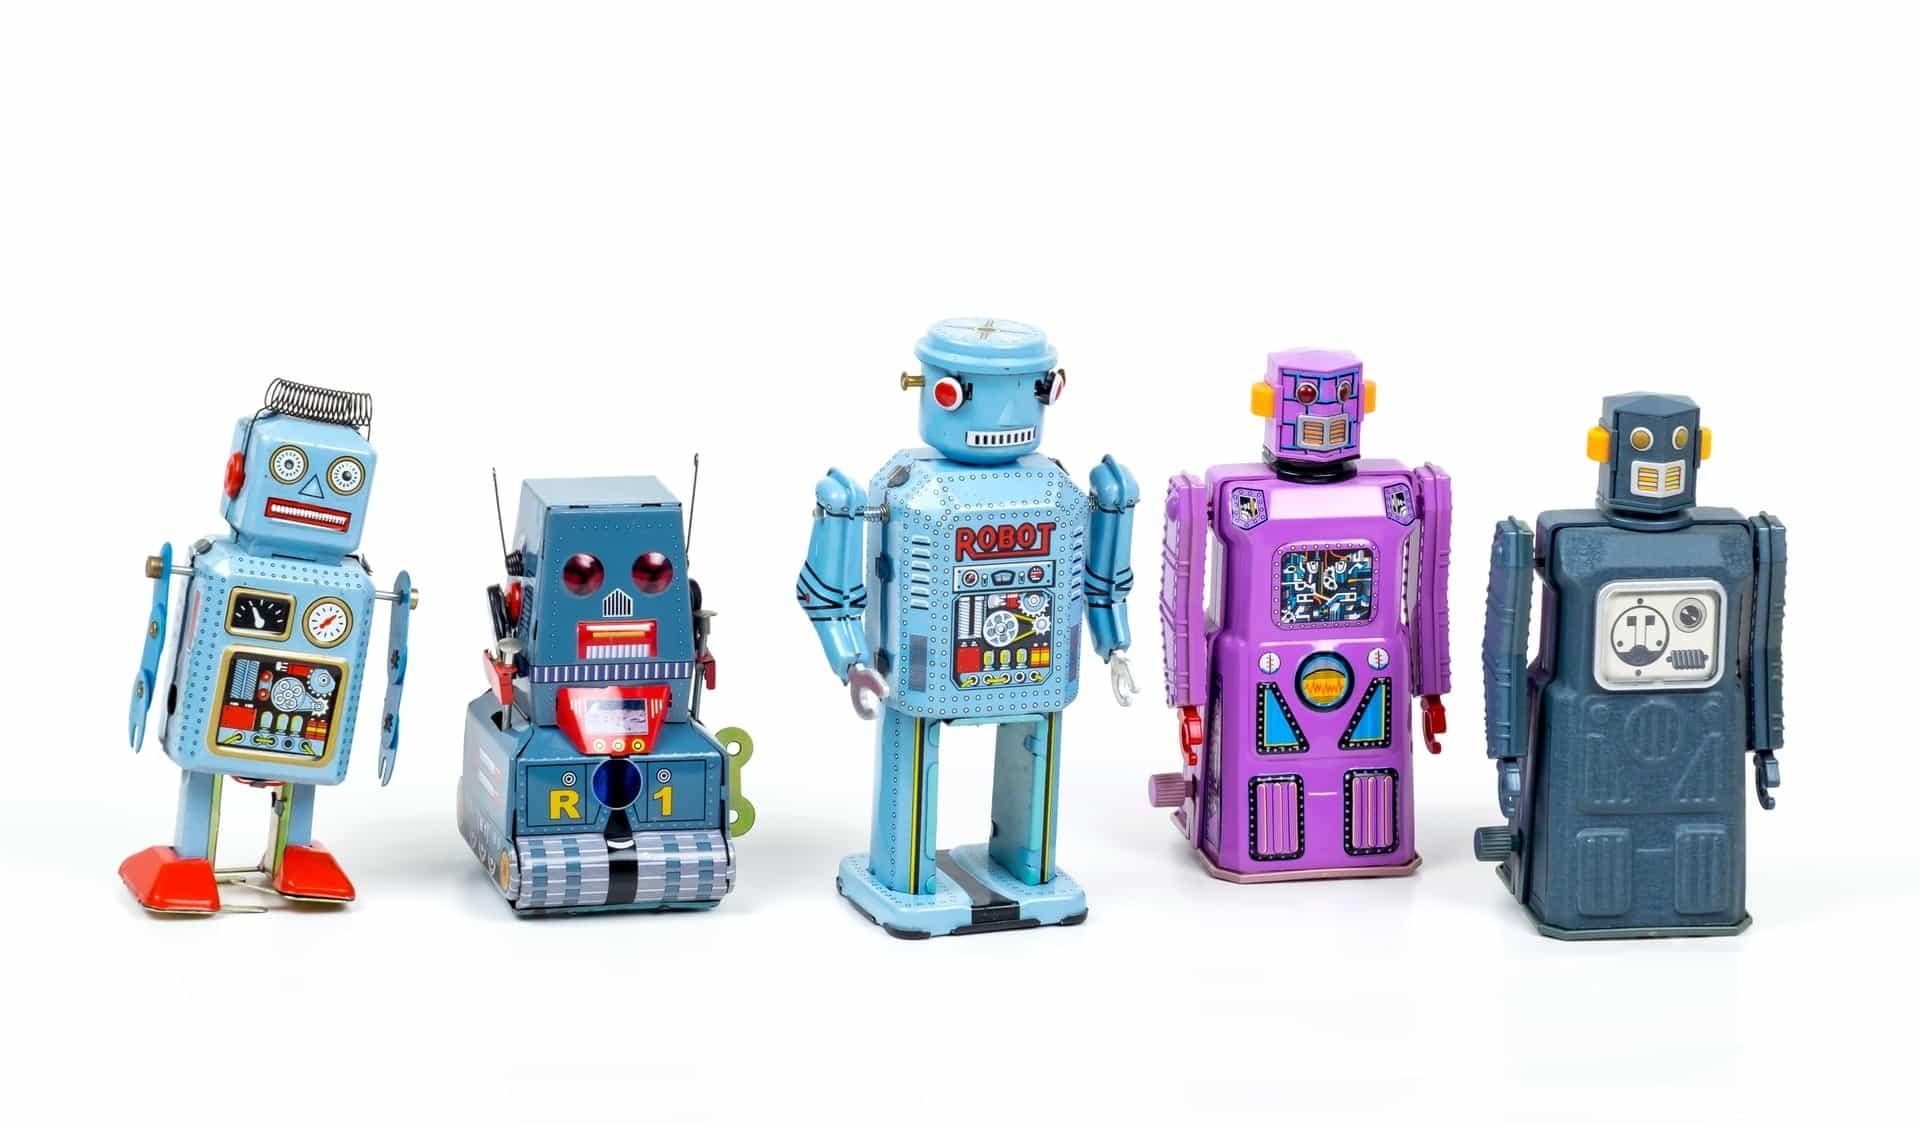 Toy robots, photo by Eric Krull on Unsplash